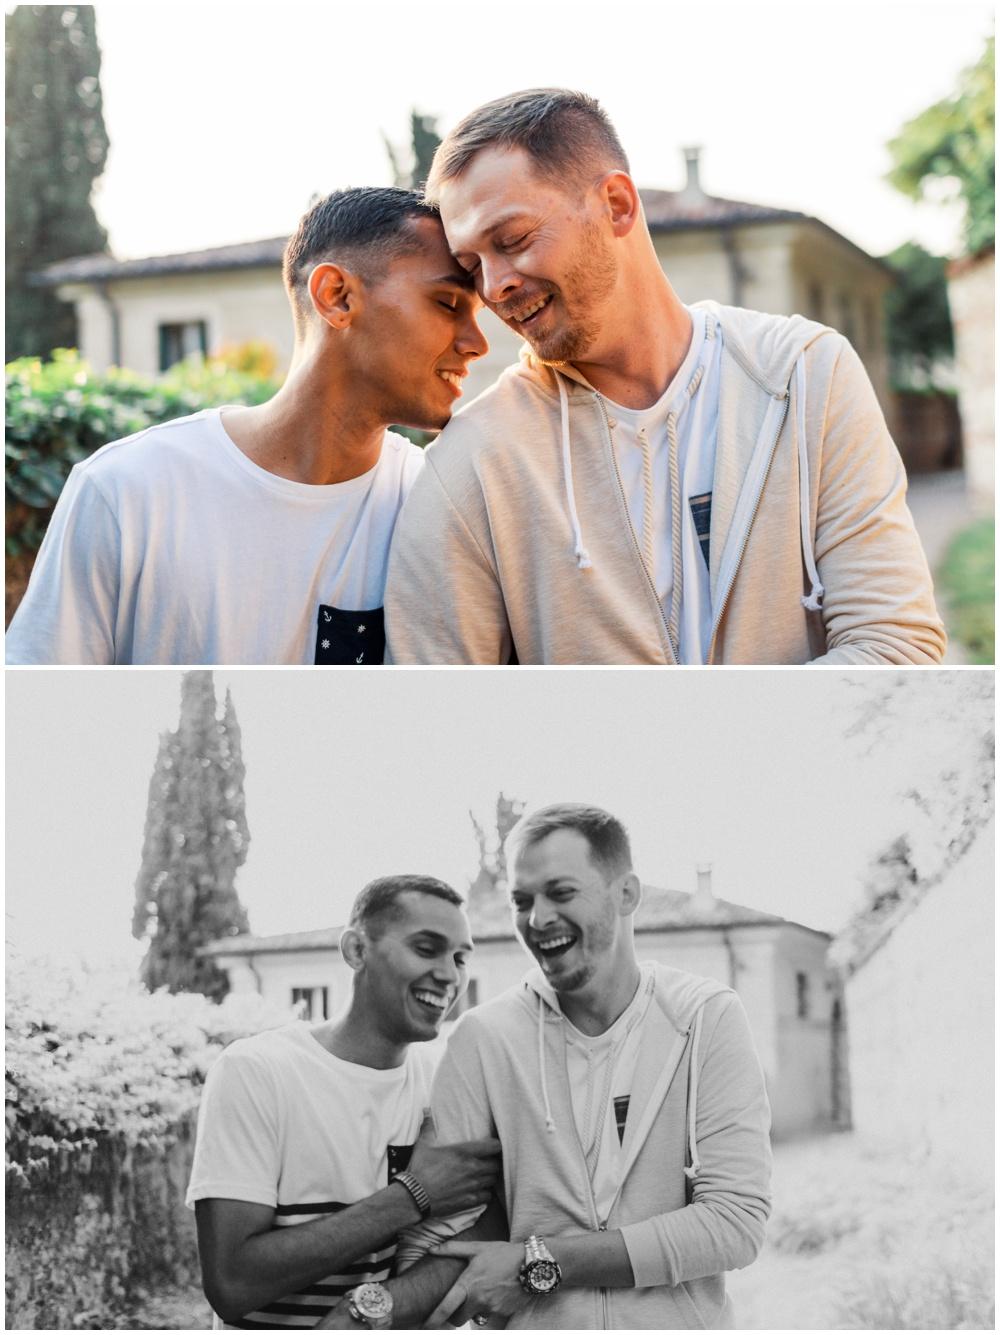 same-sex-wedding-photographer-venice-italy_0014.jpg